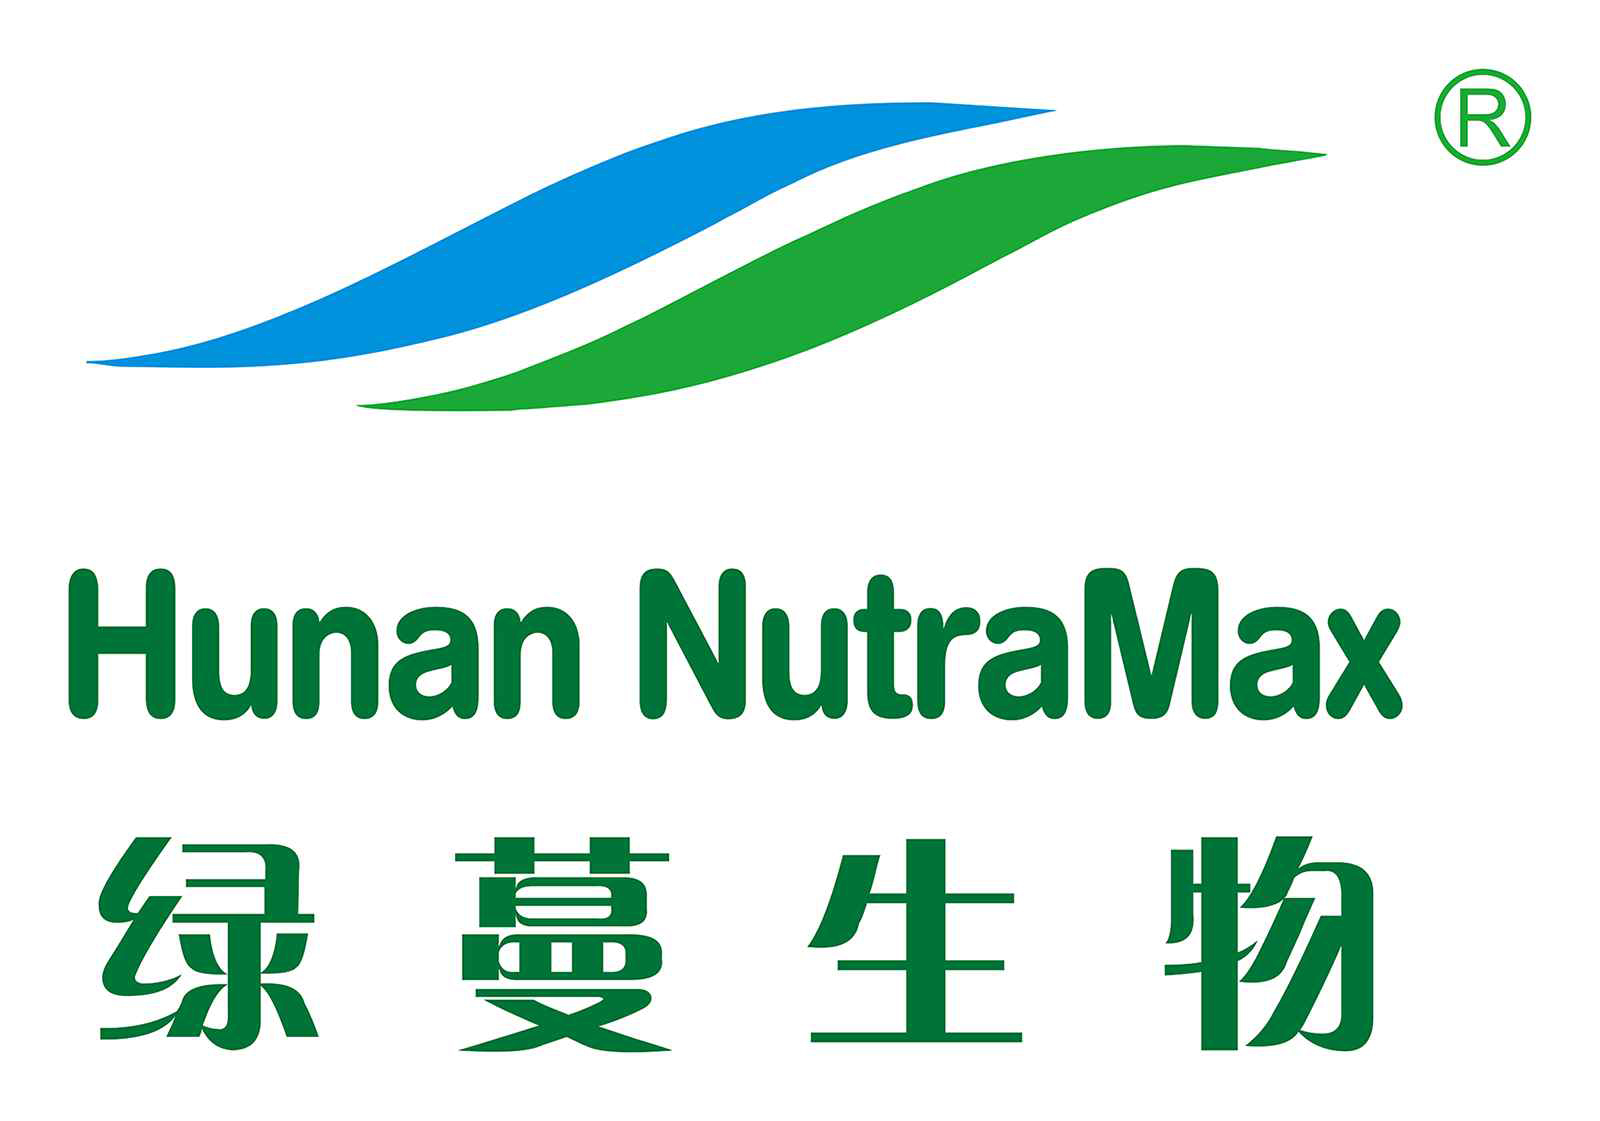 HUNAN NUTRAMAX